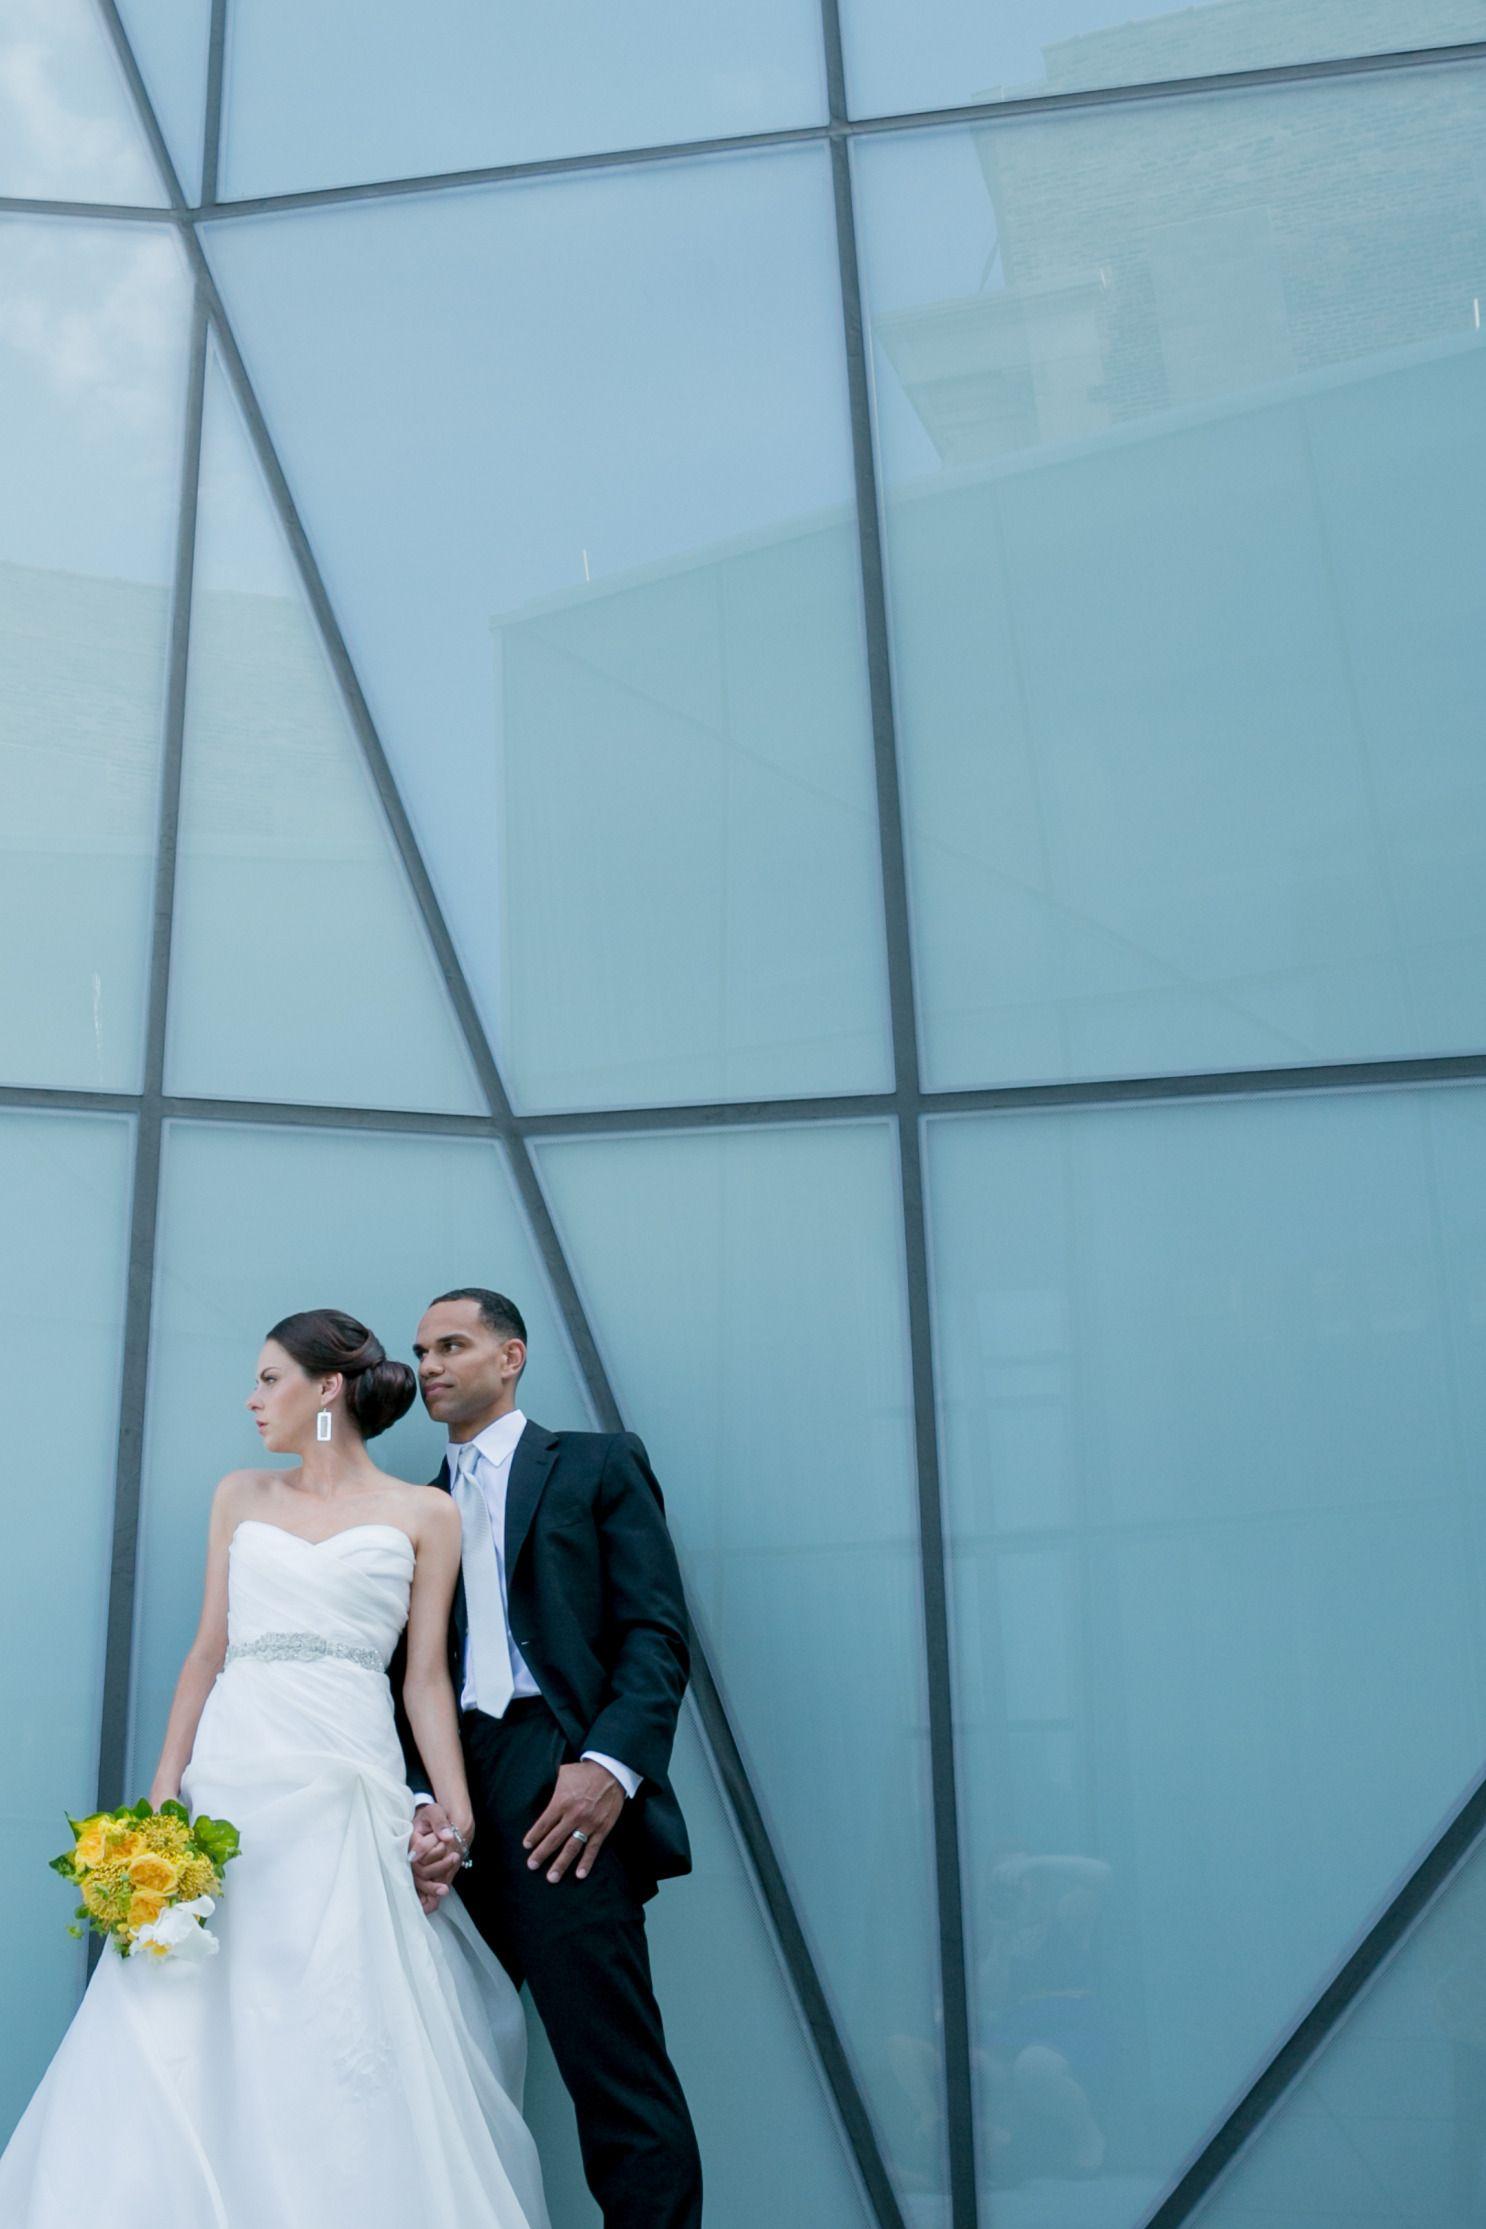 Modern wedding inspiration from ann u kam photography citygirl